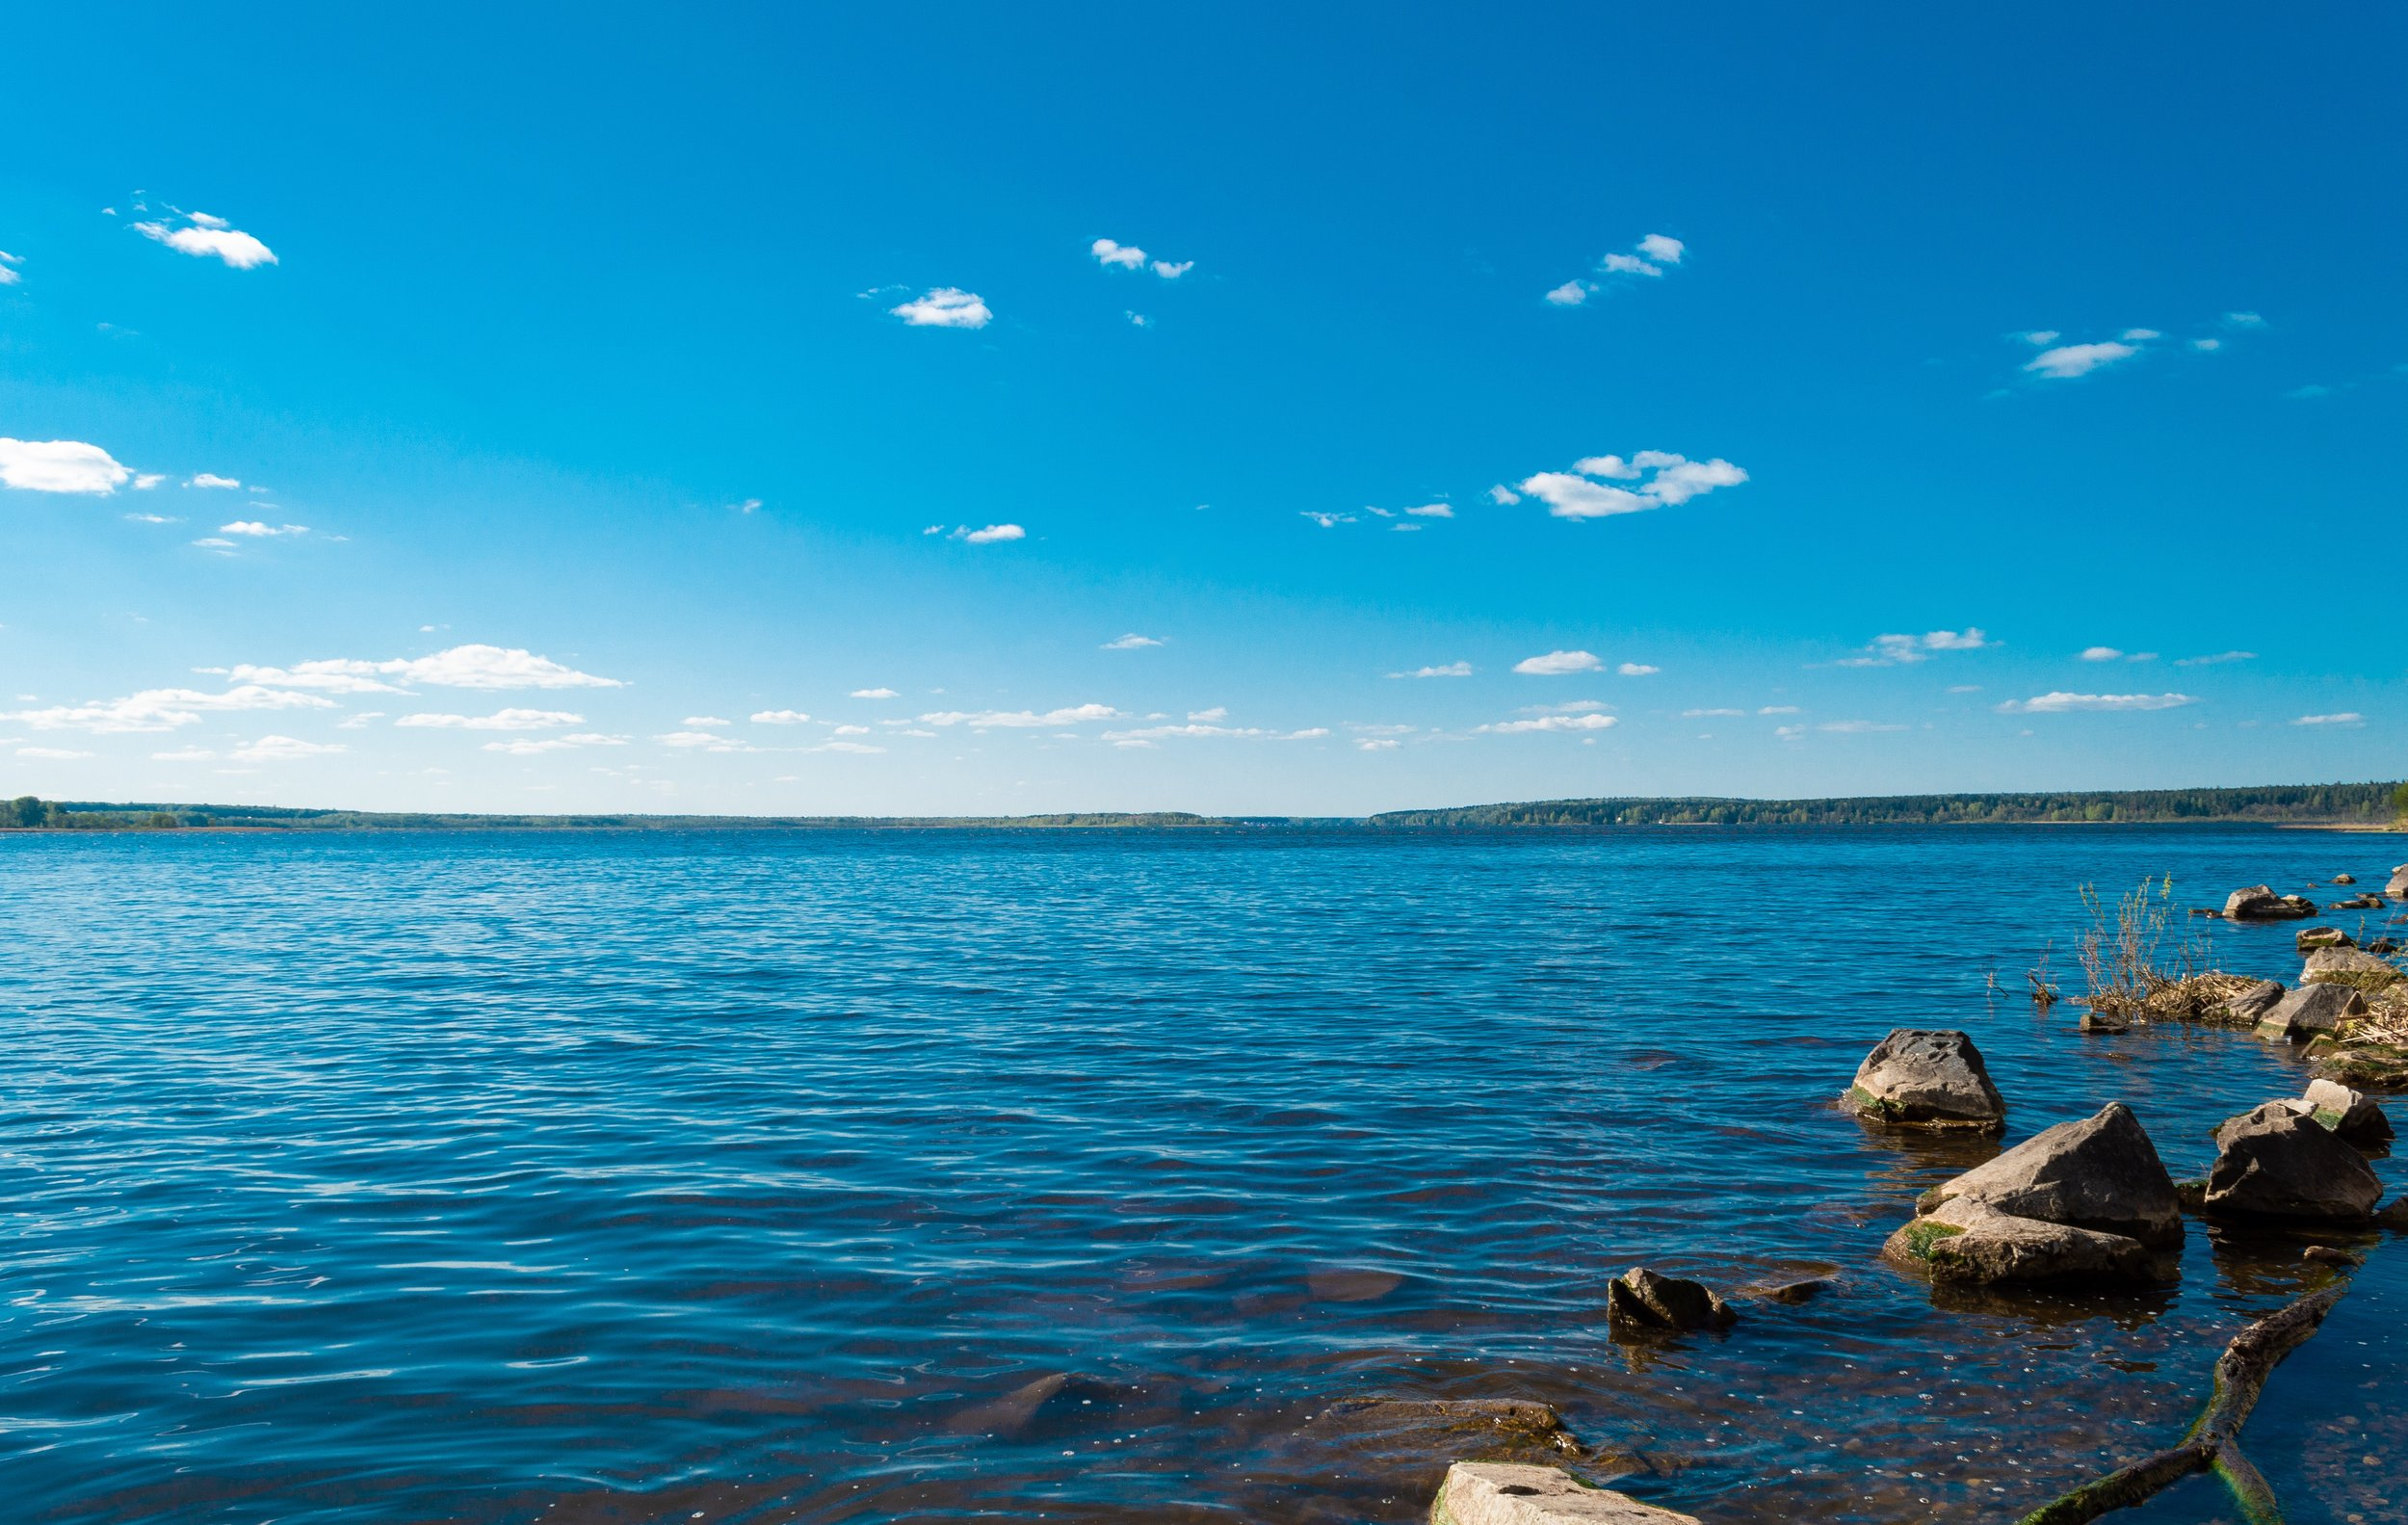 beautiful-calm-waters-horizon-2091351.jpg